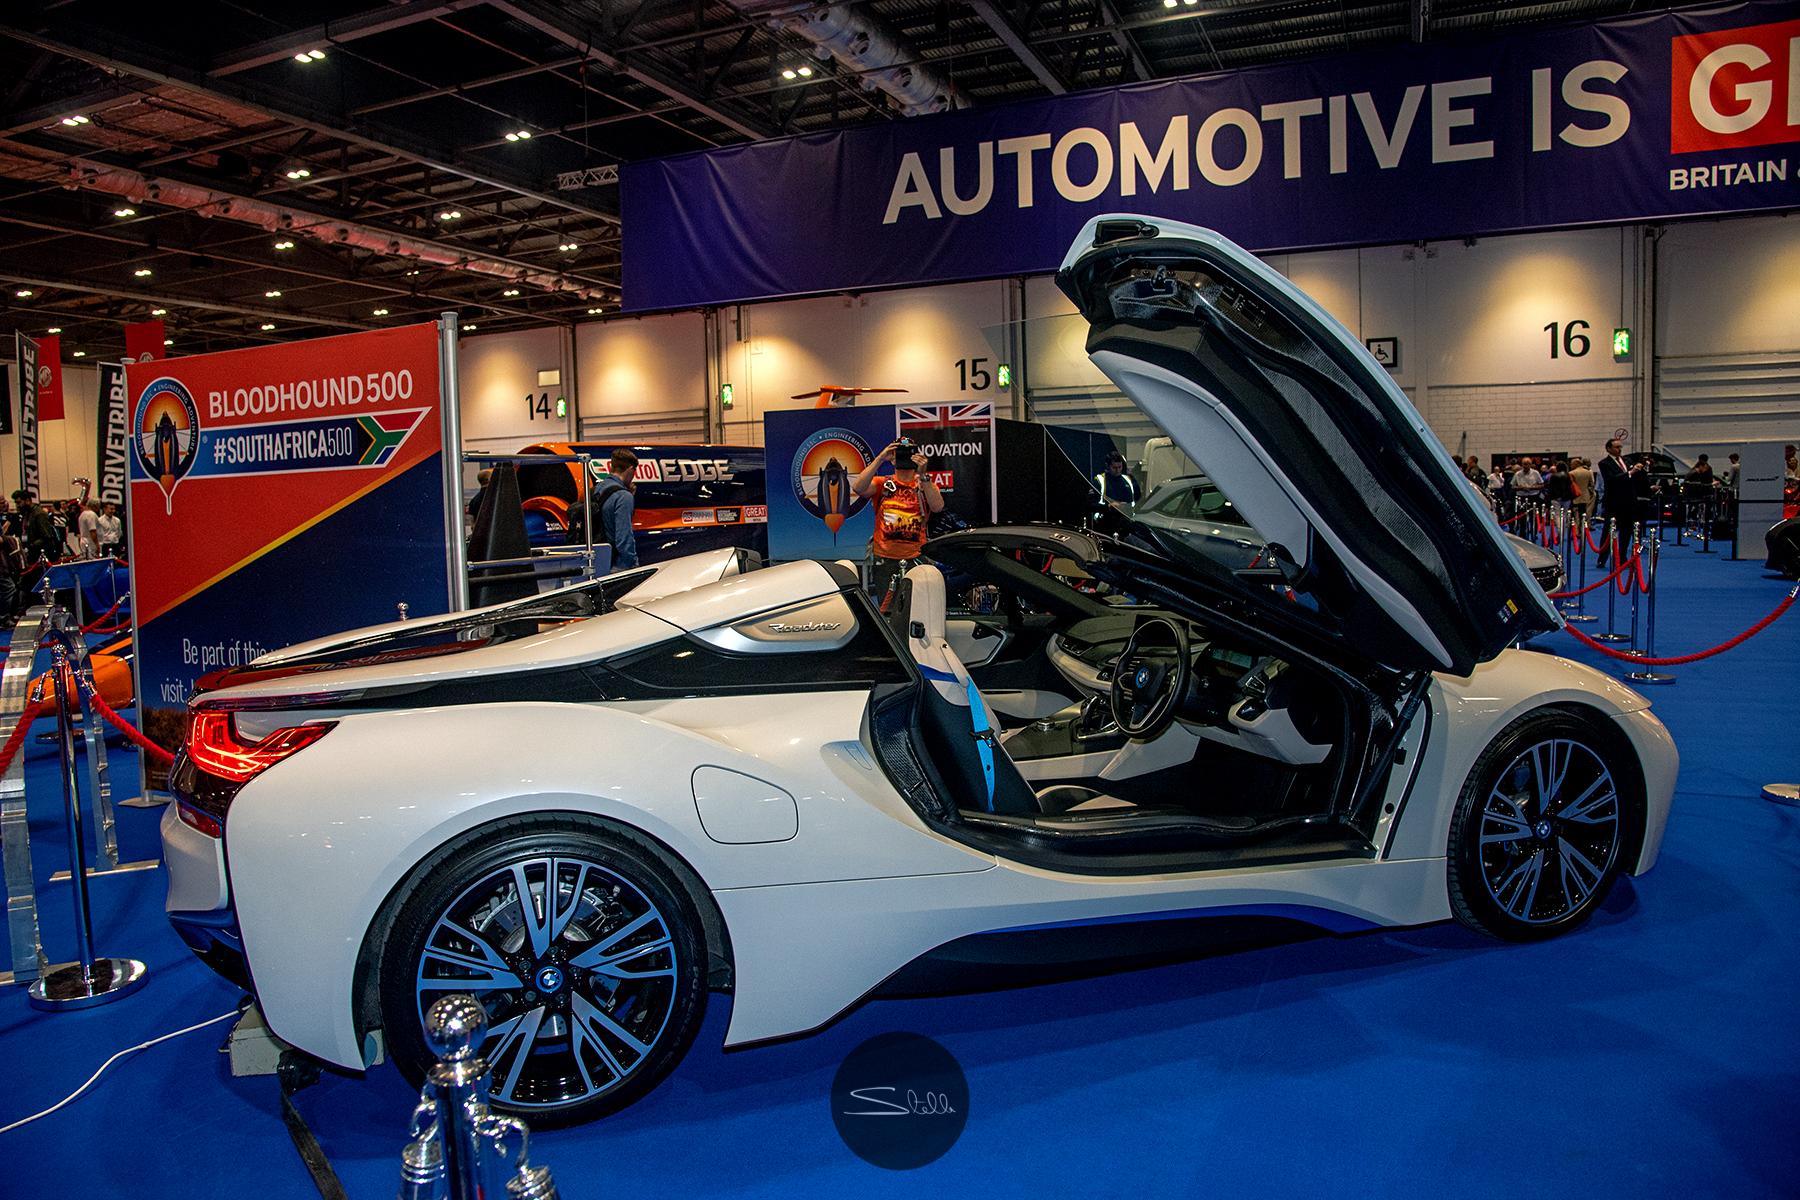 Stella Scordellis The London Motor Show 2018 38 Watermarked.jpg